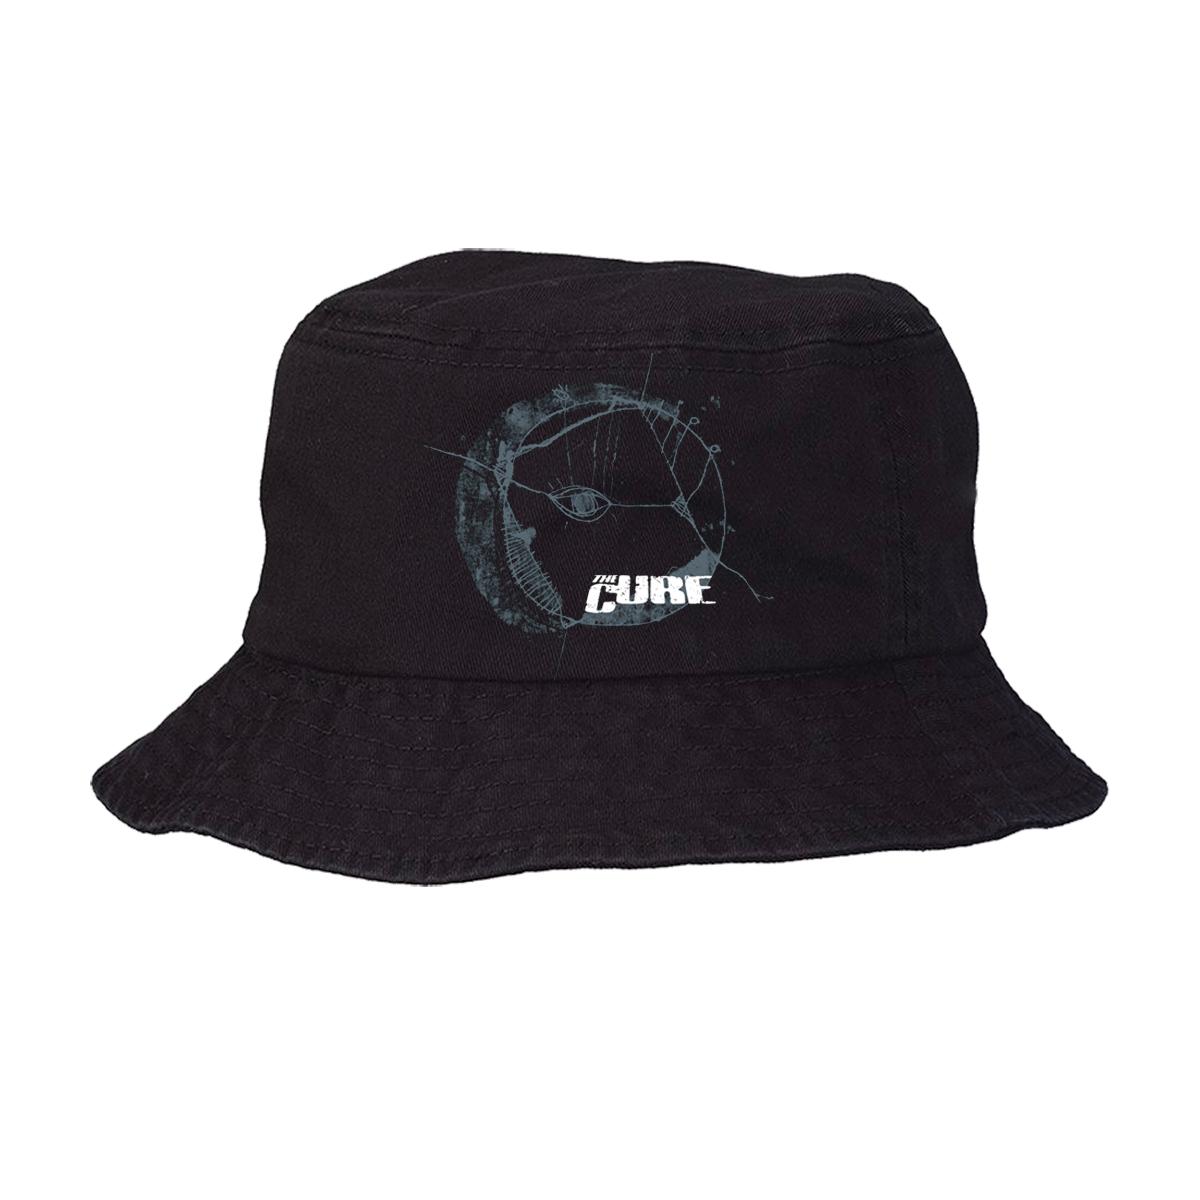 Eyemoon Black Bucket Hat